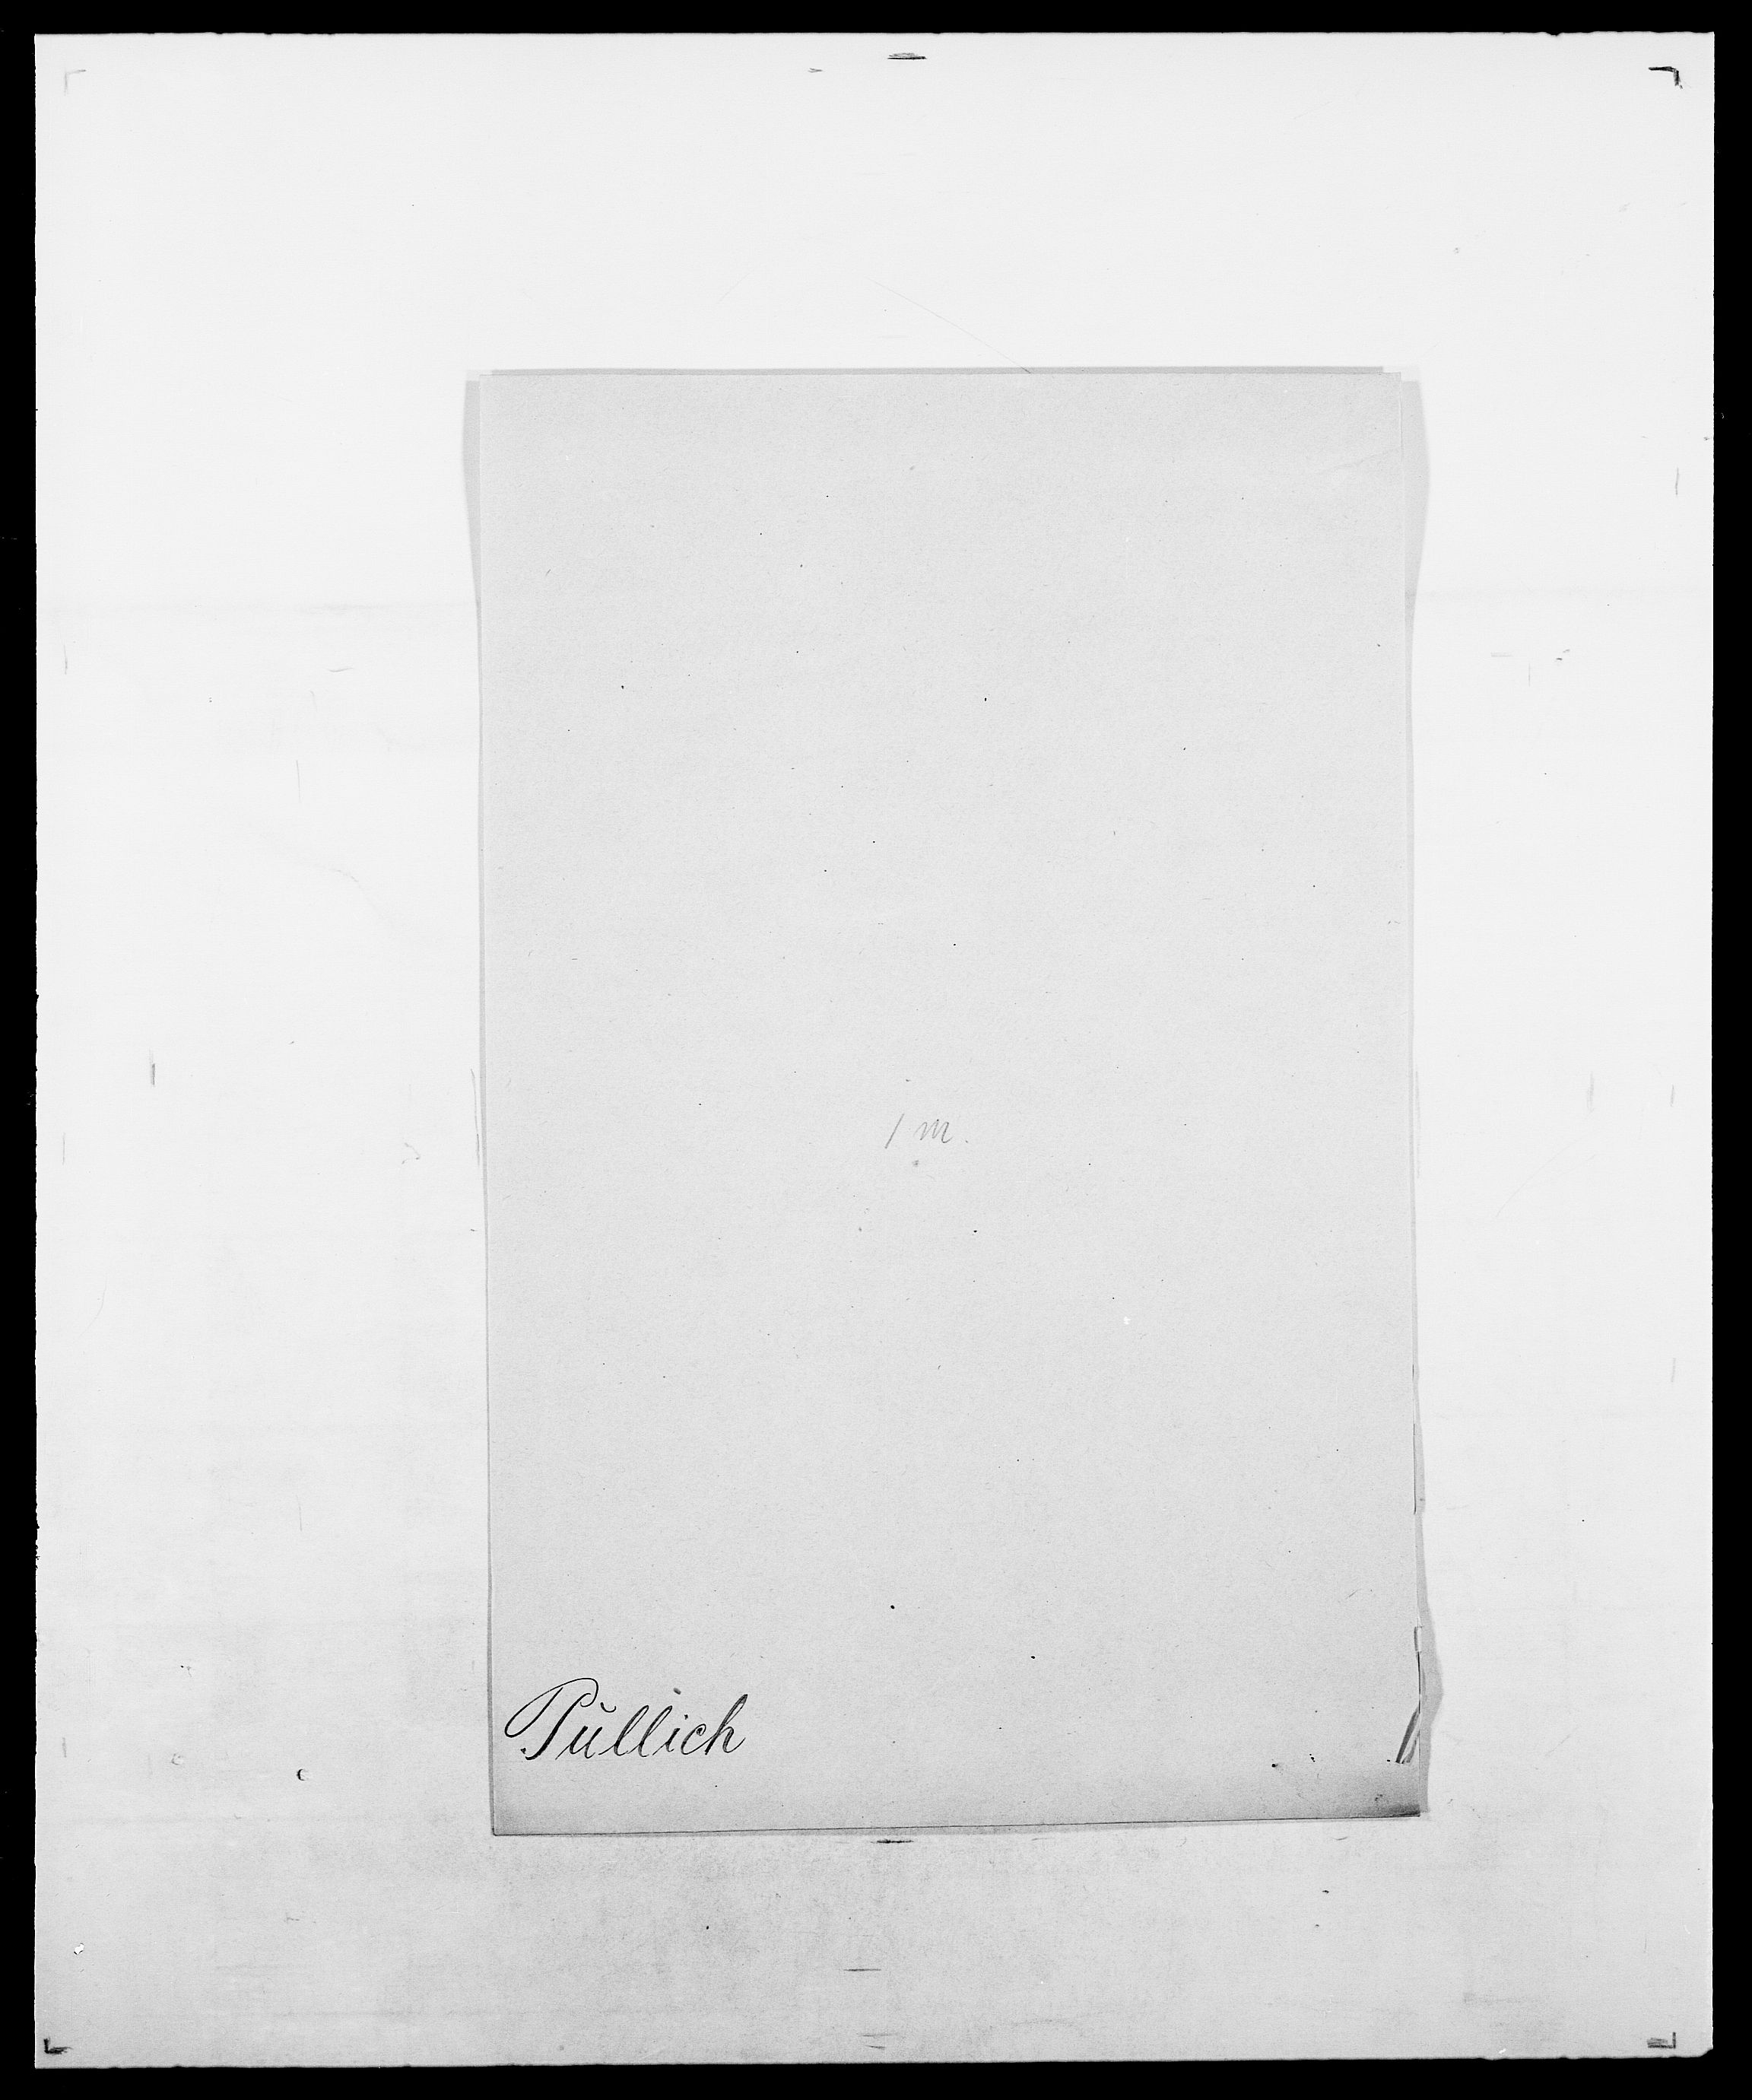 SAO, Delgobe, Charles Antoine - samling, D/Da/L0031: de Place - Raaum, s. 439